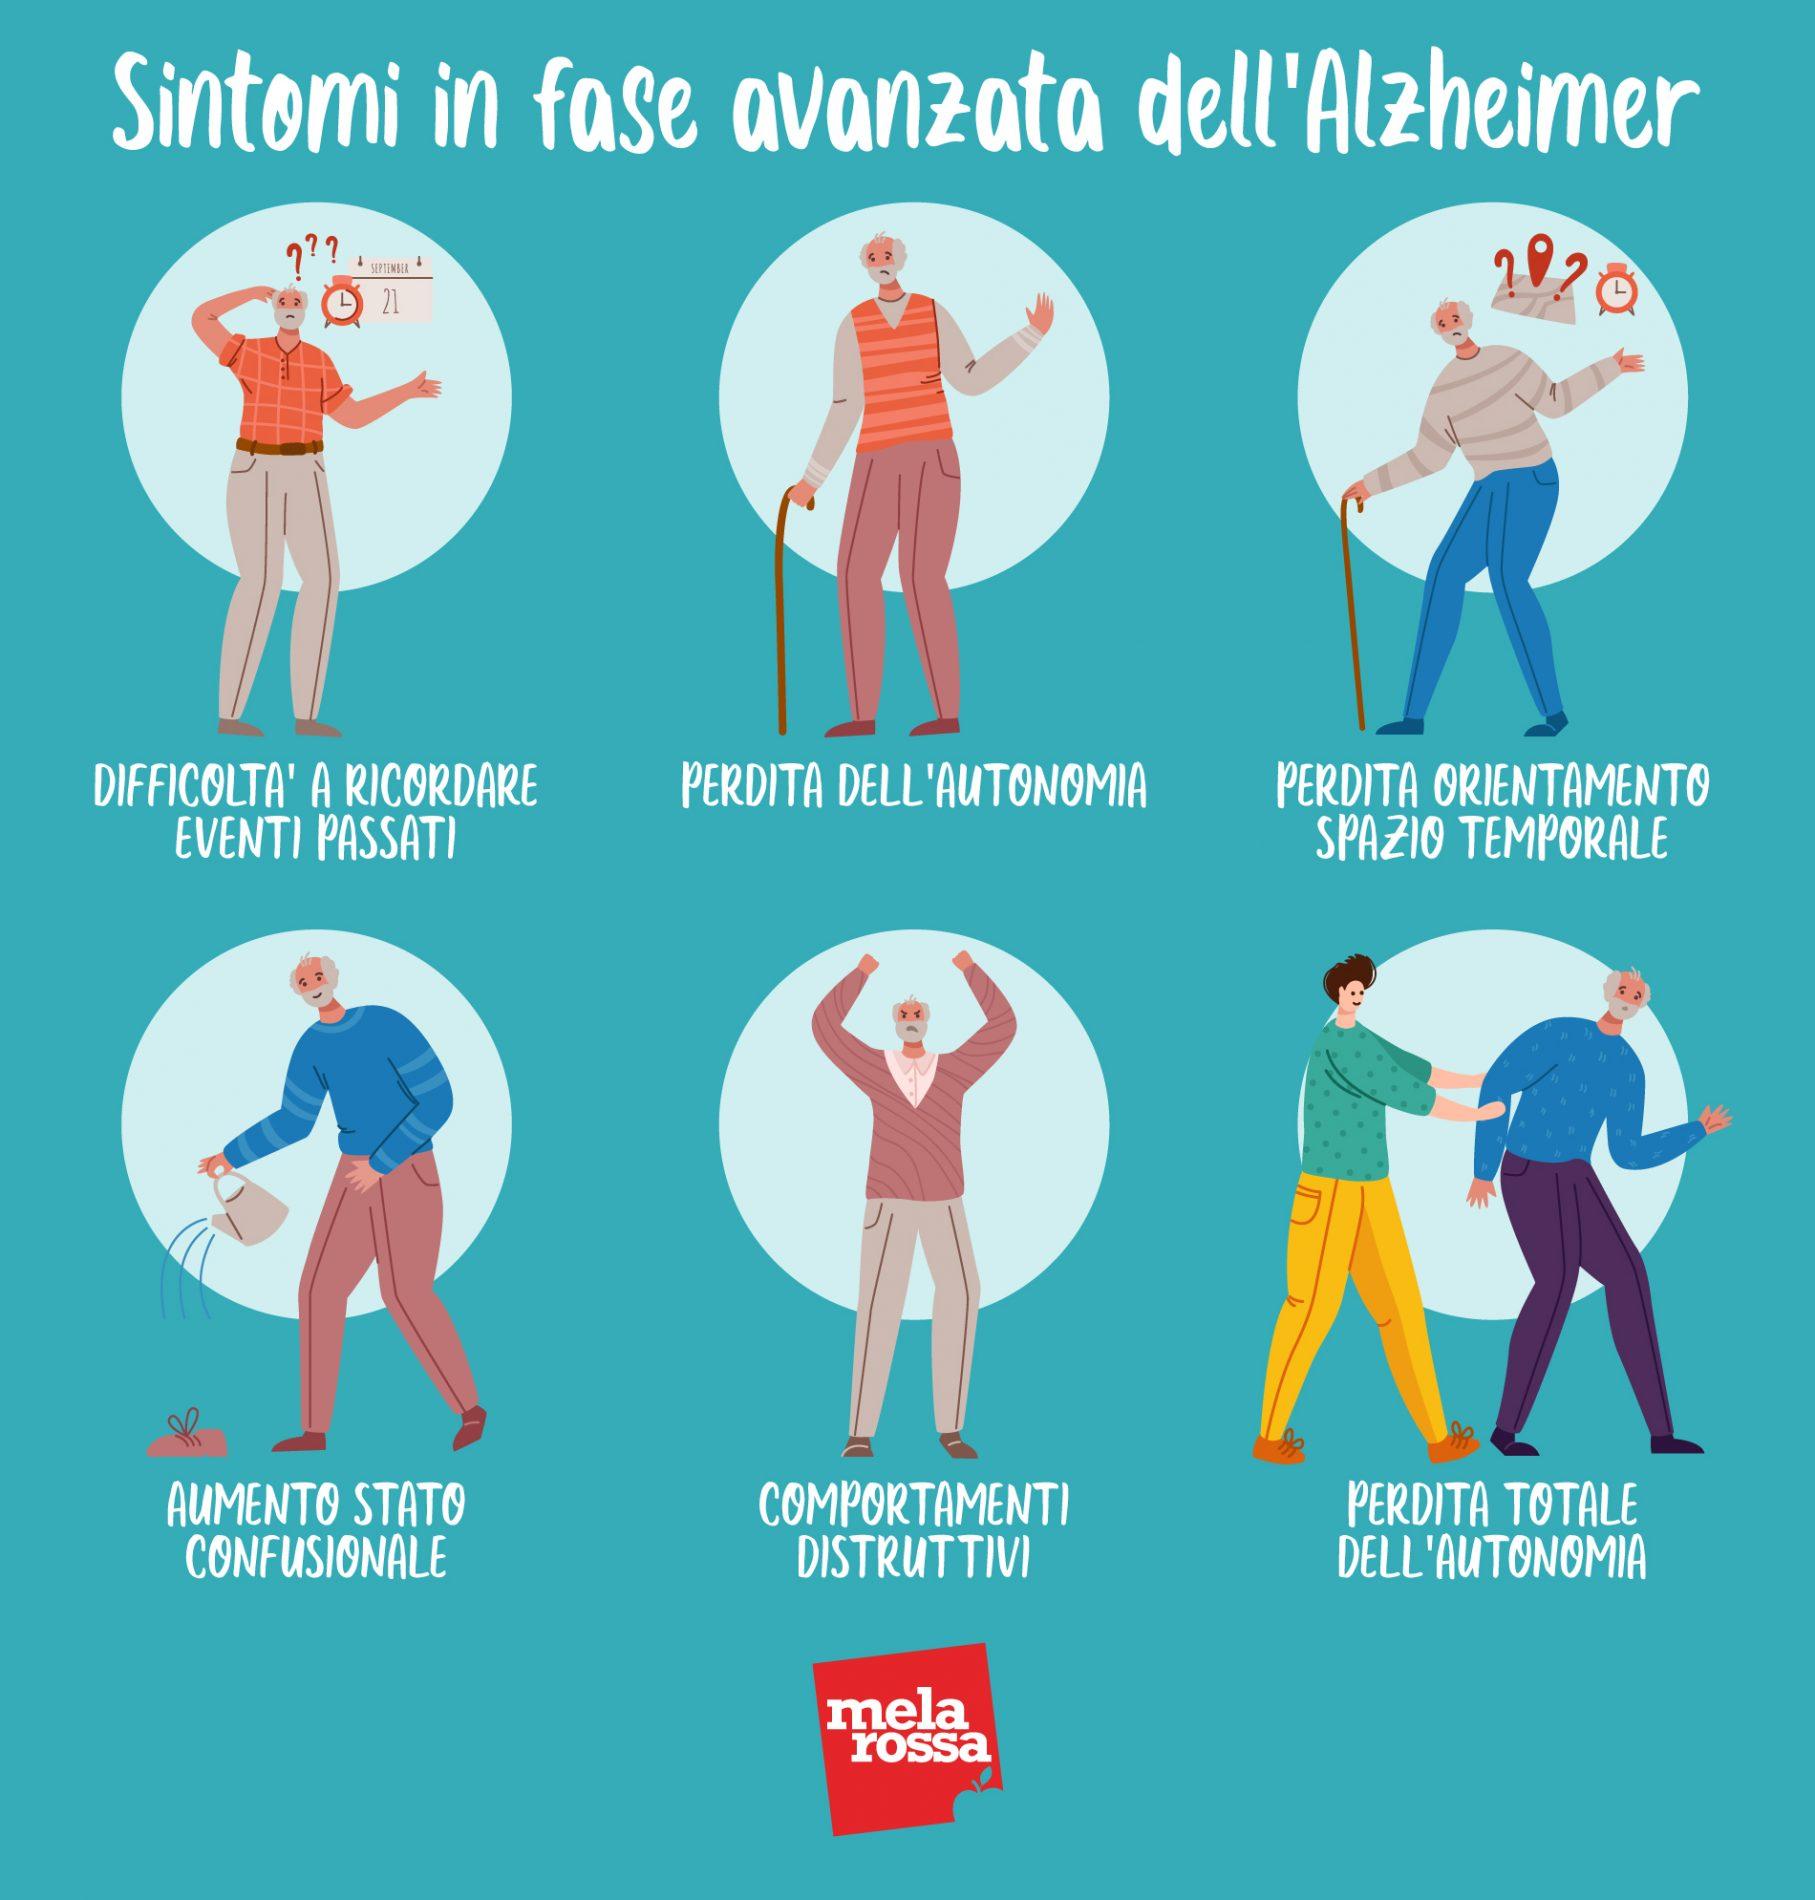 morbo di alzheimer: sintomi in fase avanzata